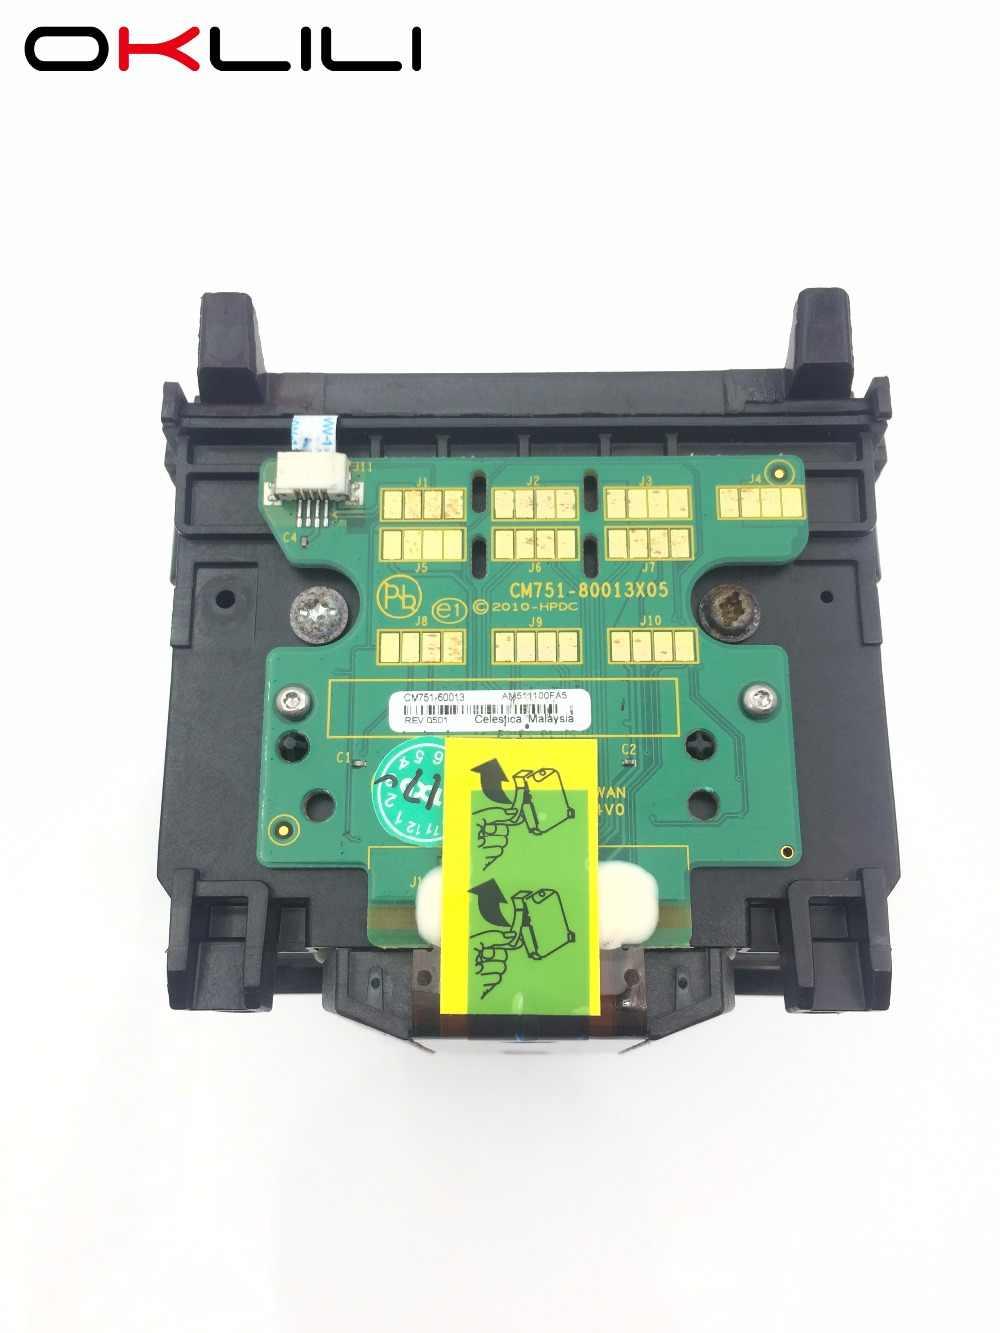 Asli CM751-80013A 950 951 950XL 951XL Printhead Print Head untuk HP Pro 8100 8600 8610 8620 8625 8630 8700 251DW 251 276 276DW